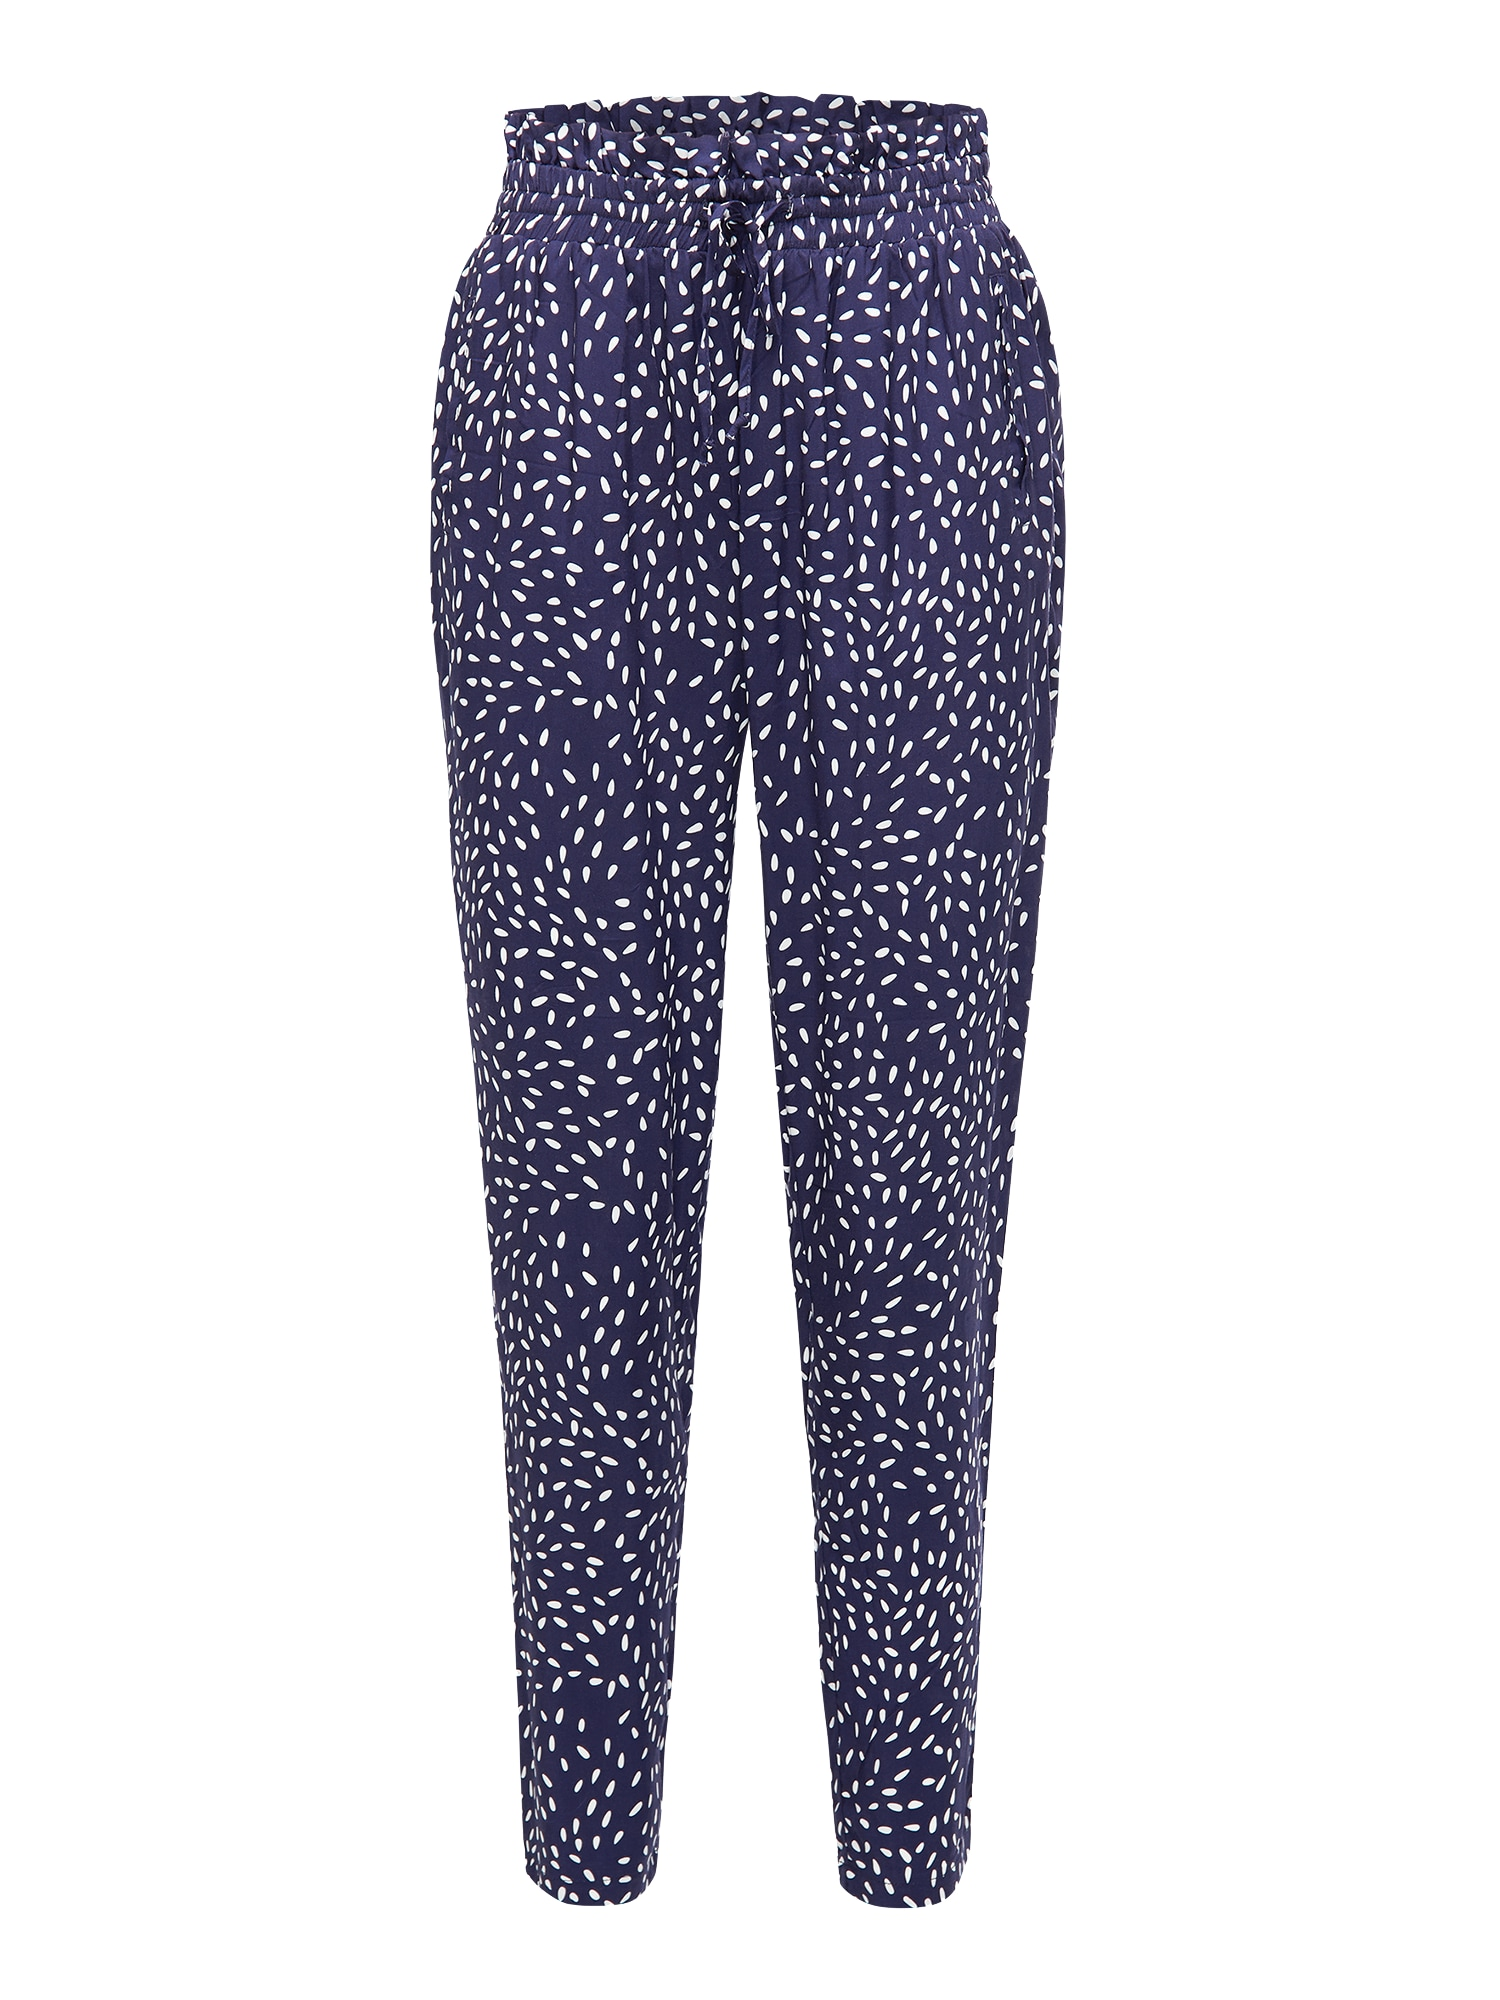 Kalhoty RAJNA 9789  tmavě modrá  bílá BROADWAY NYC FASHION